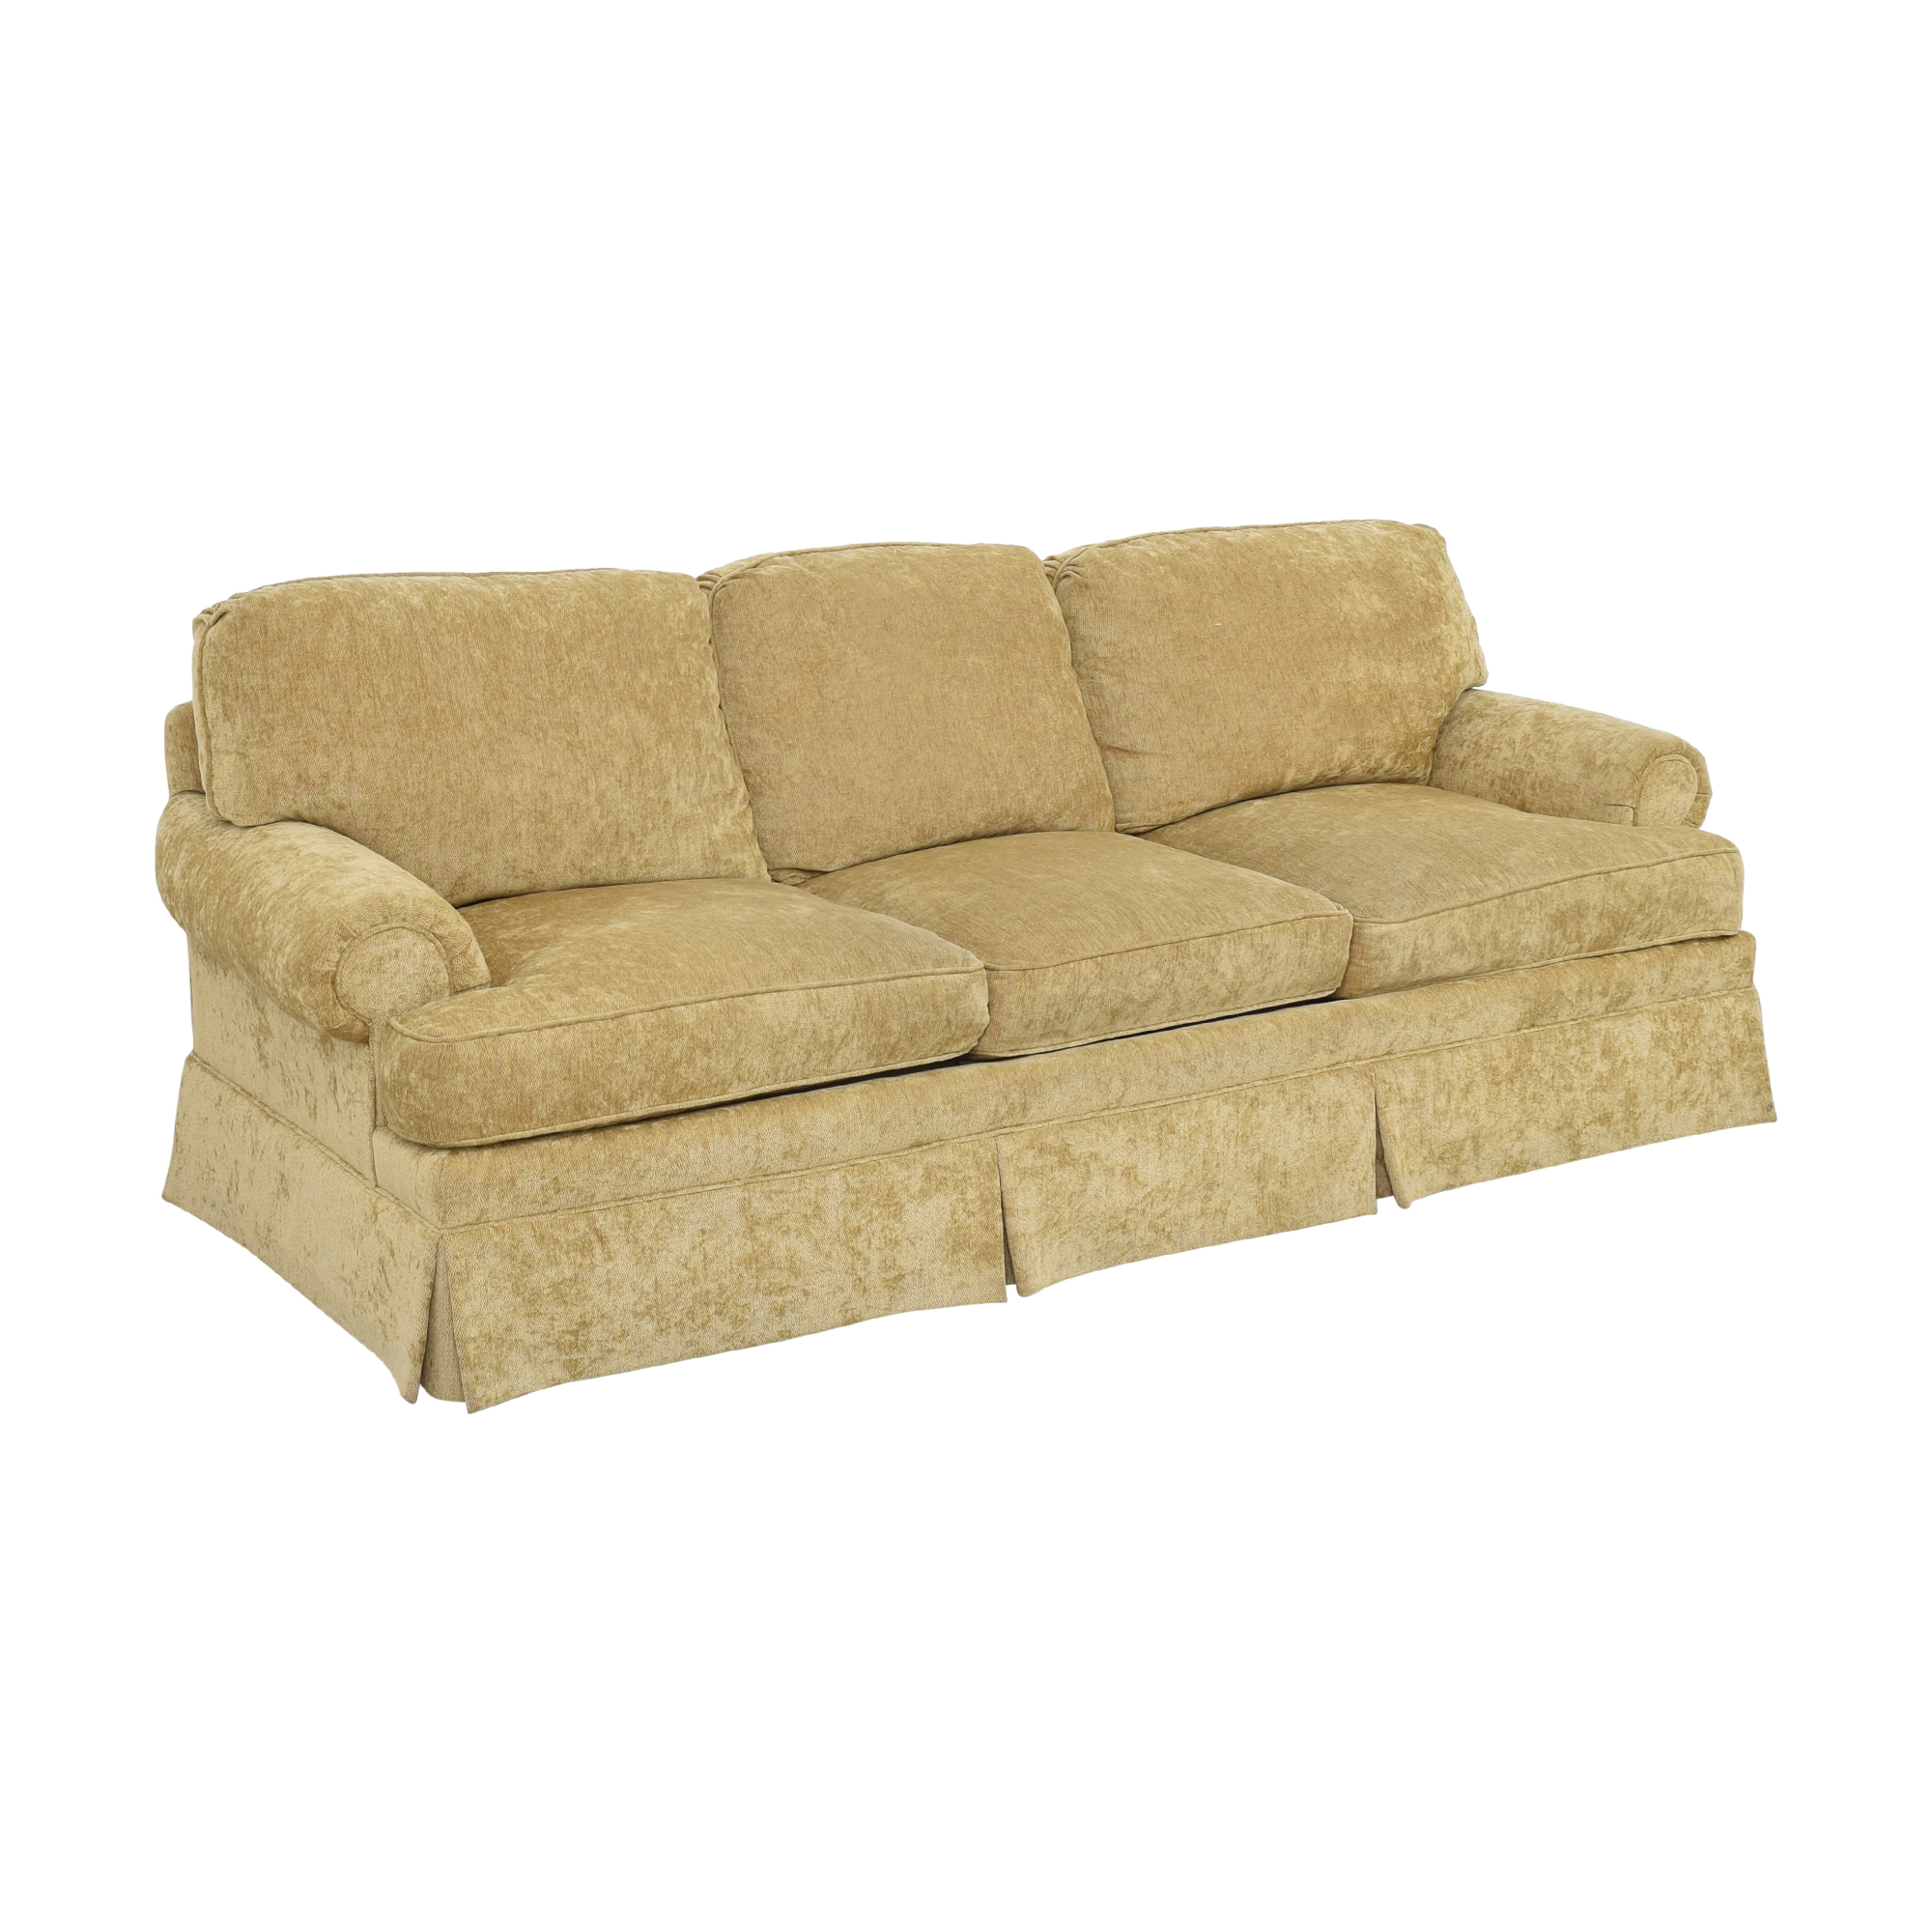 Century Furniture Century Furniture Roll Arm Skirted Sofa dimensions